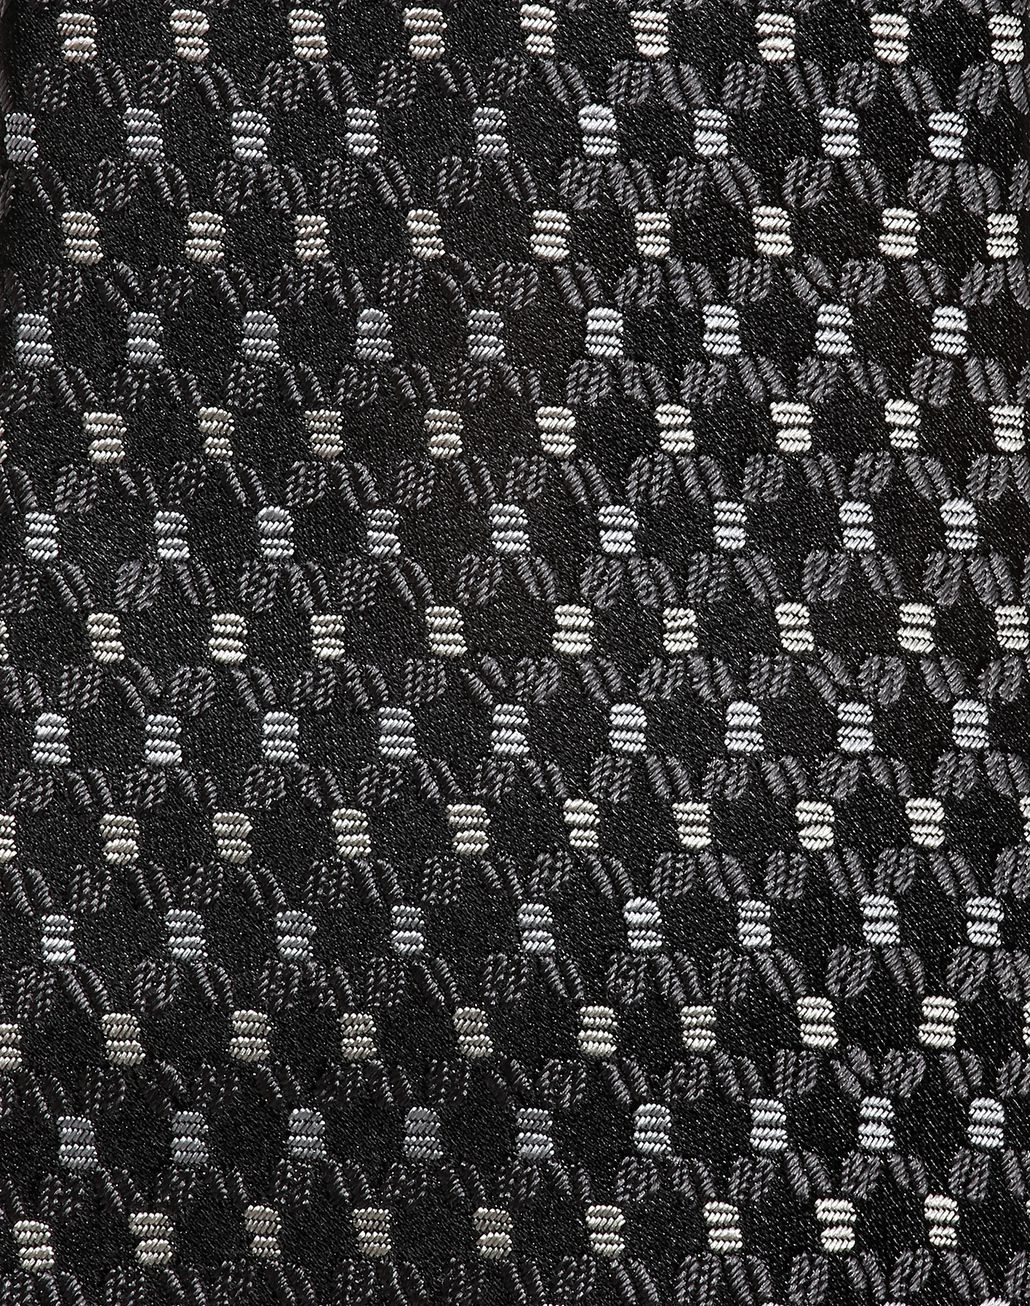 BRIONI Галстук чёрного цвета и цвета фланели с микроузором Галстук Для Мужчин d